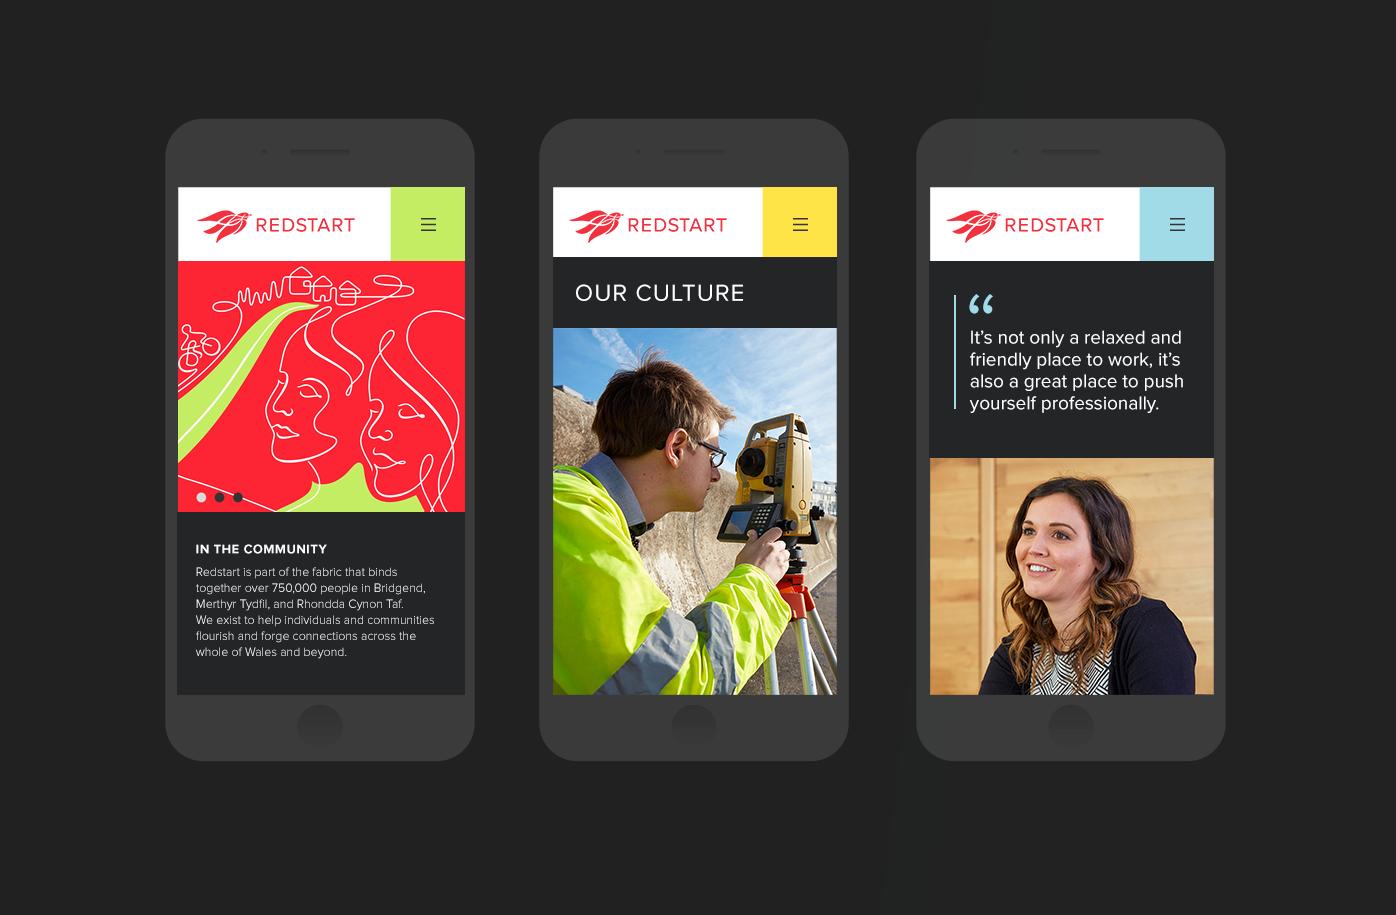 responsive website design on mobile